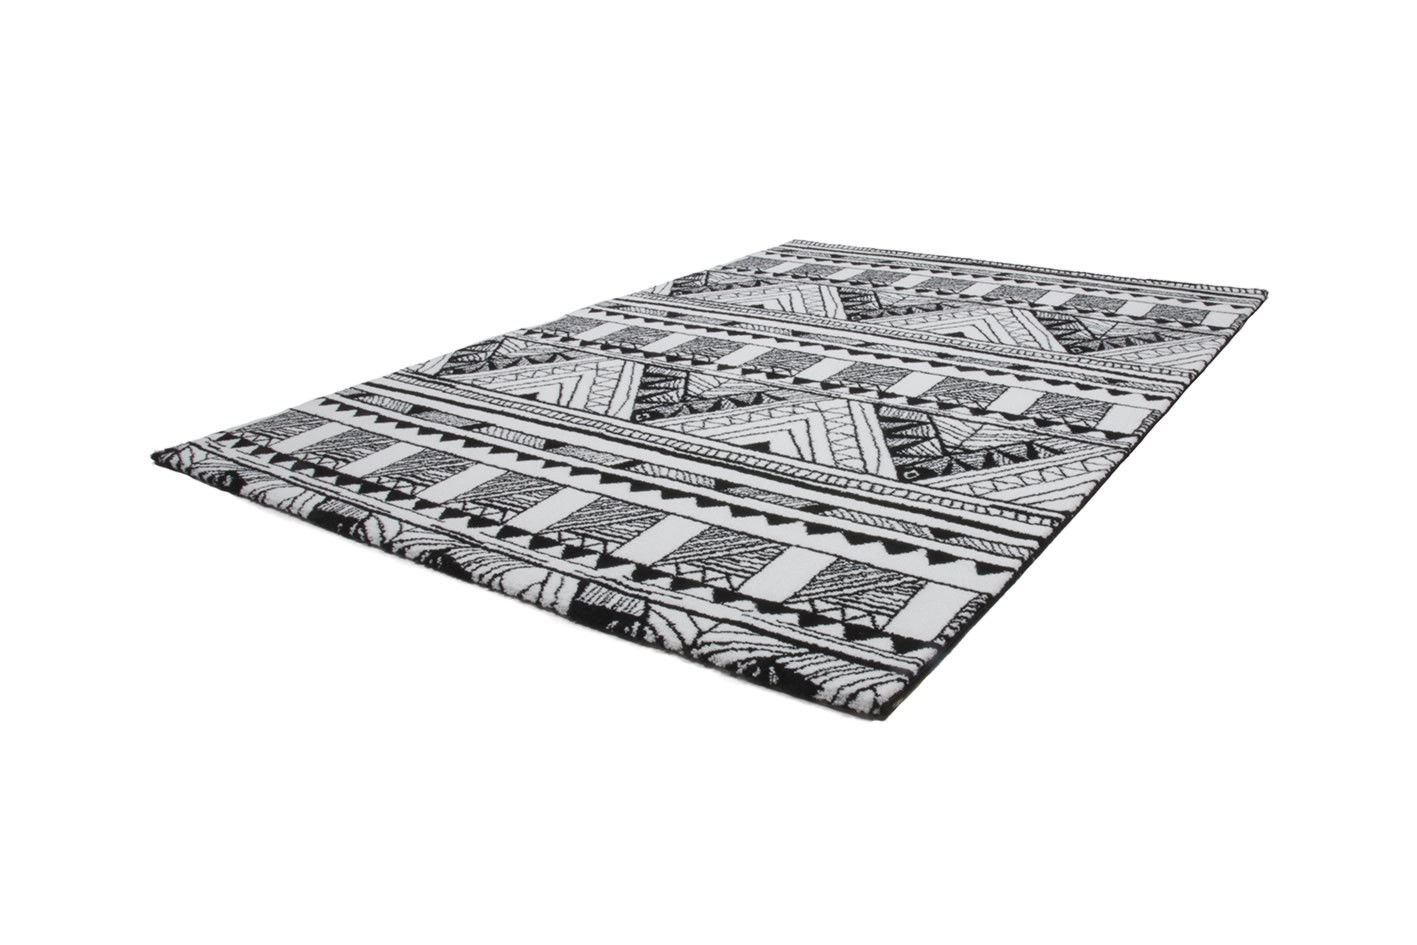 tapis motifs moderne pour salon noir et blanc toluca. Black Bedroom Furniture Sets. Home Design Ideas